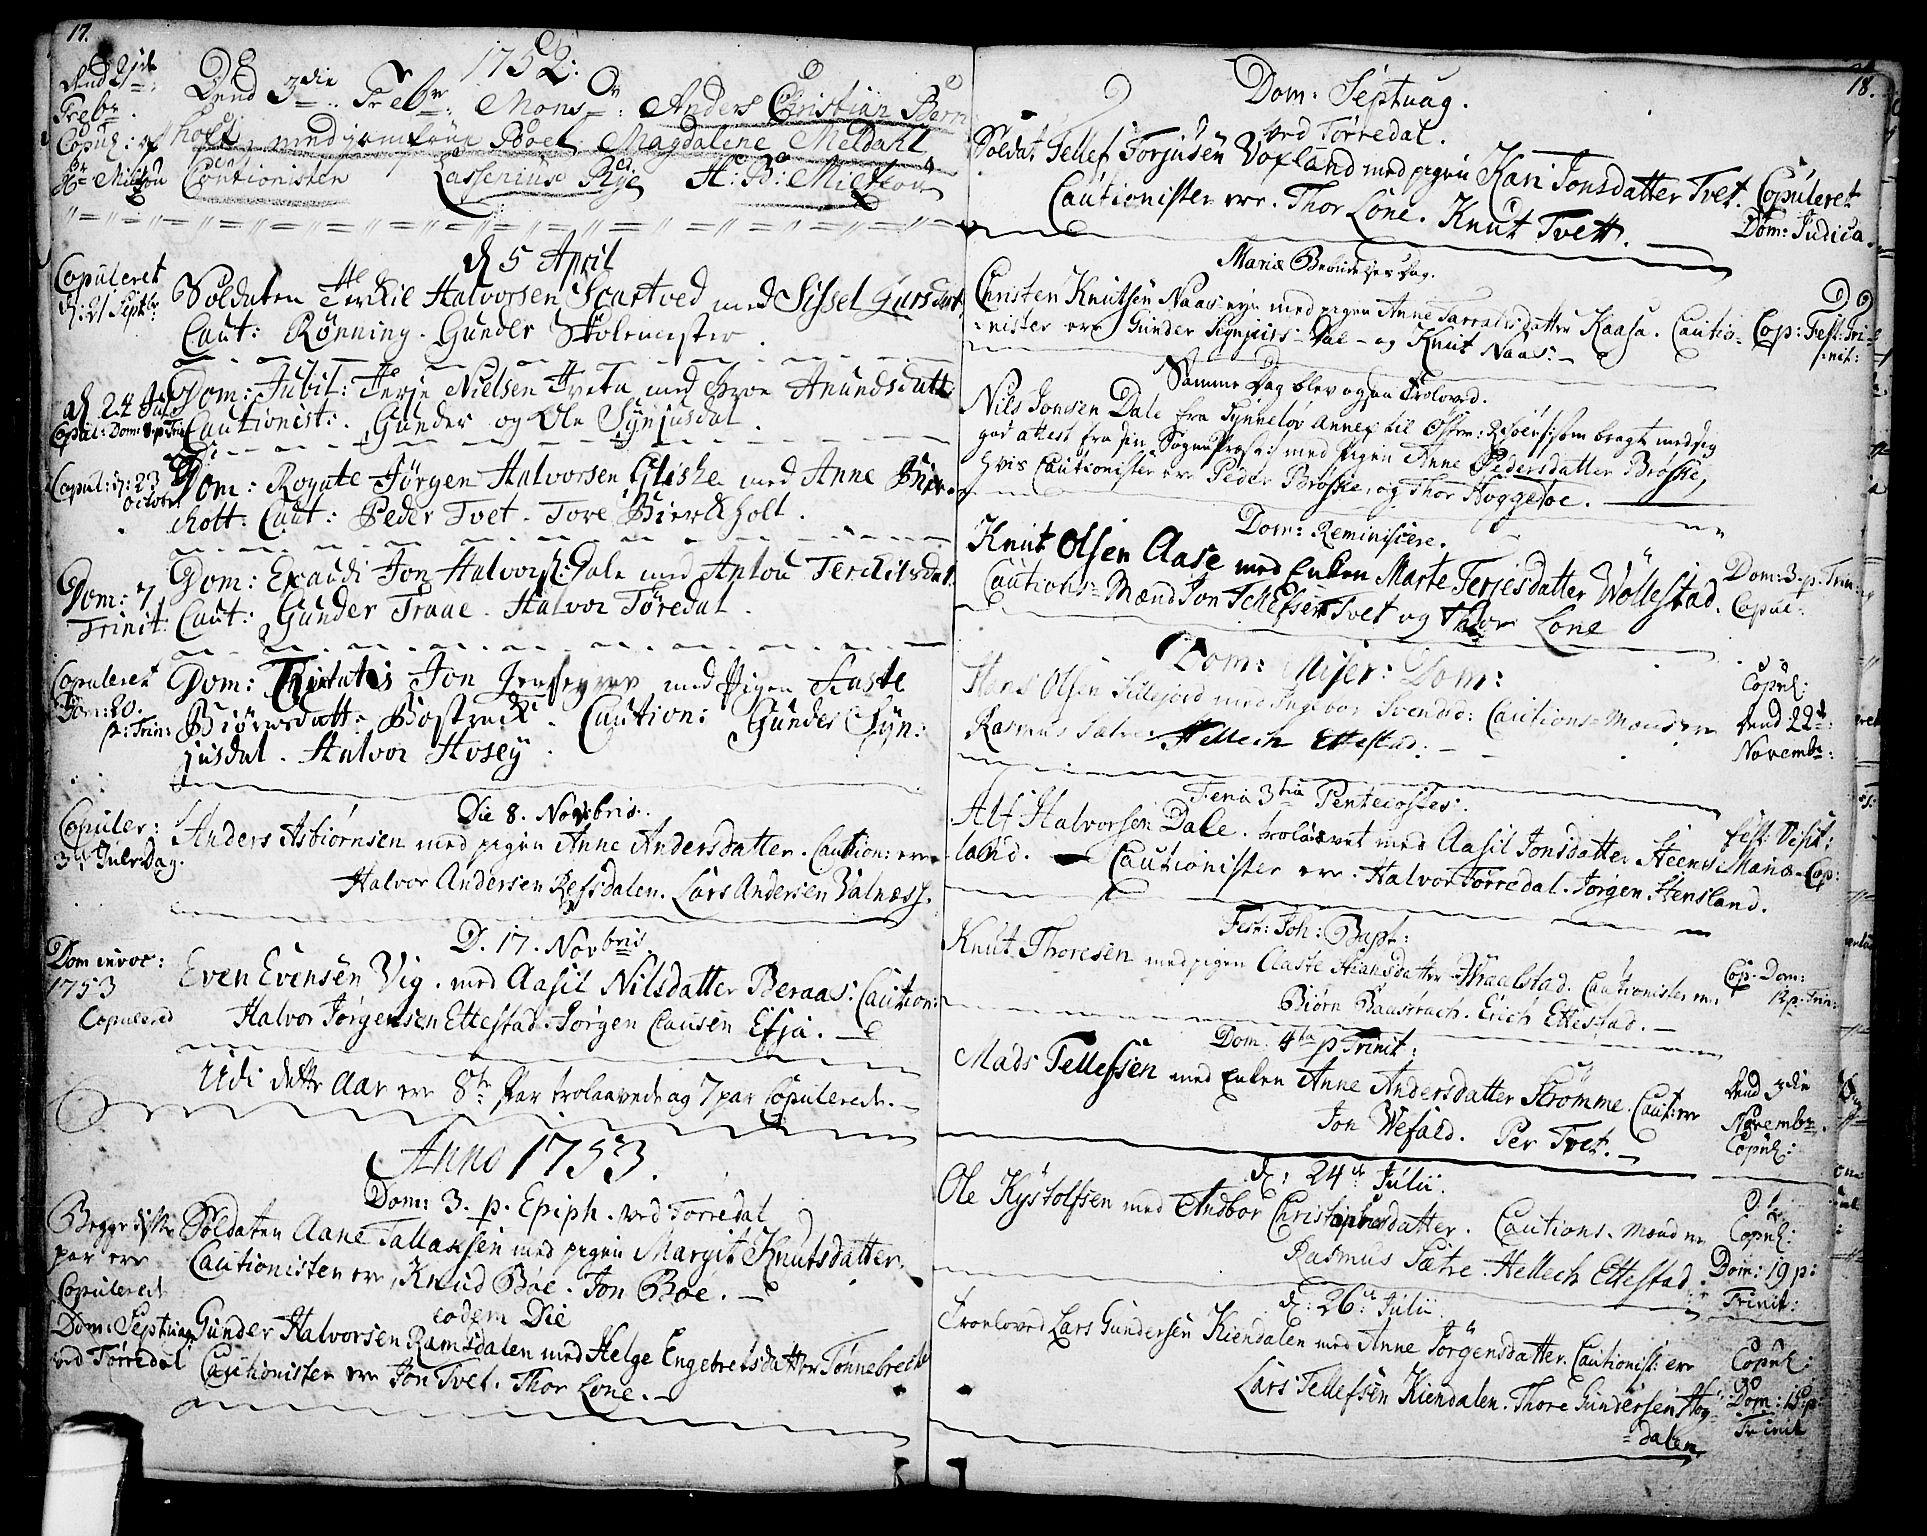 SAKO, Drangedal kirkebøker, F/Fa/L0001: Ministerialbok nr. 1, 1697-1767, s. 17-18